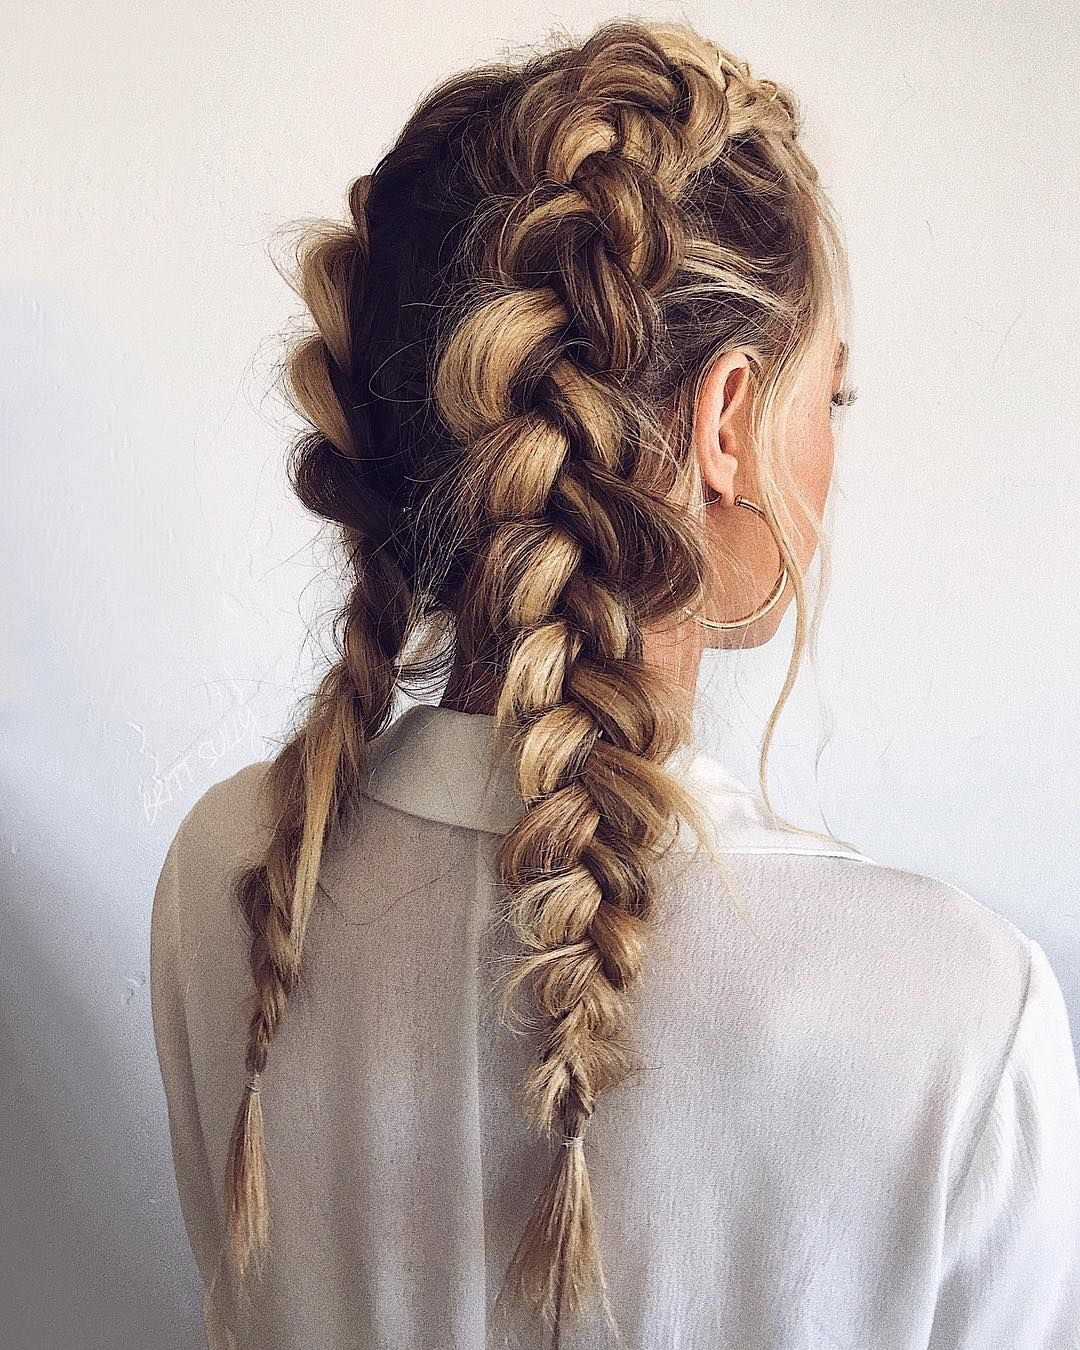 15 Gorgeous Beach Hair Ideas For Summer Easy Beach Hairstyles Beach Hair Beach Hair Updo